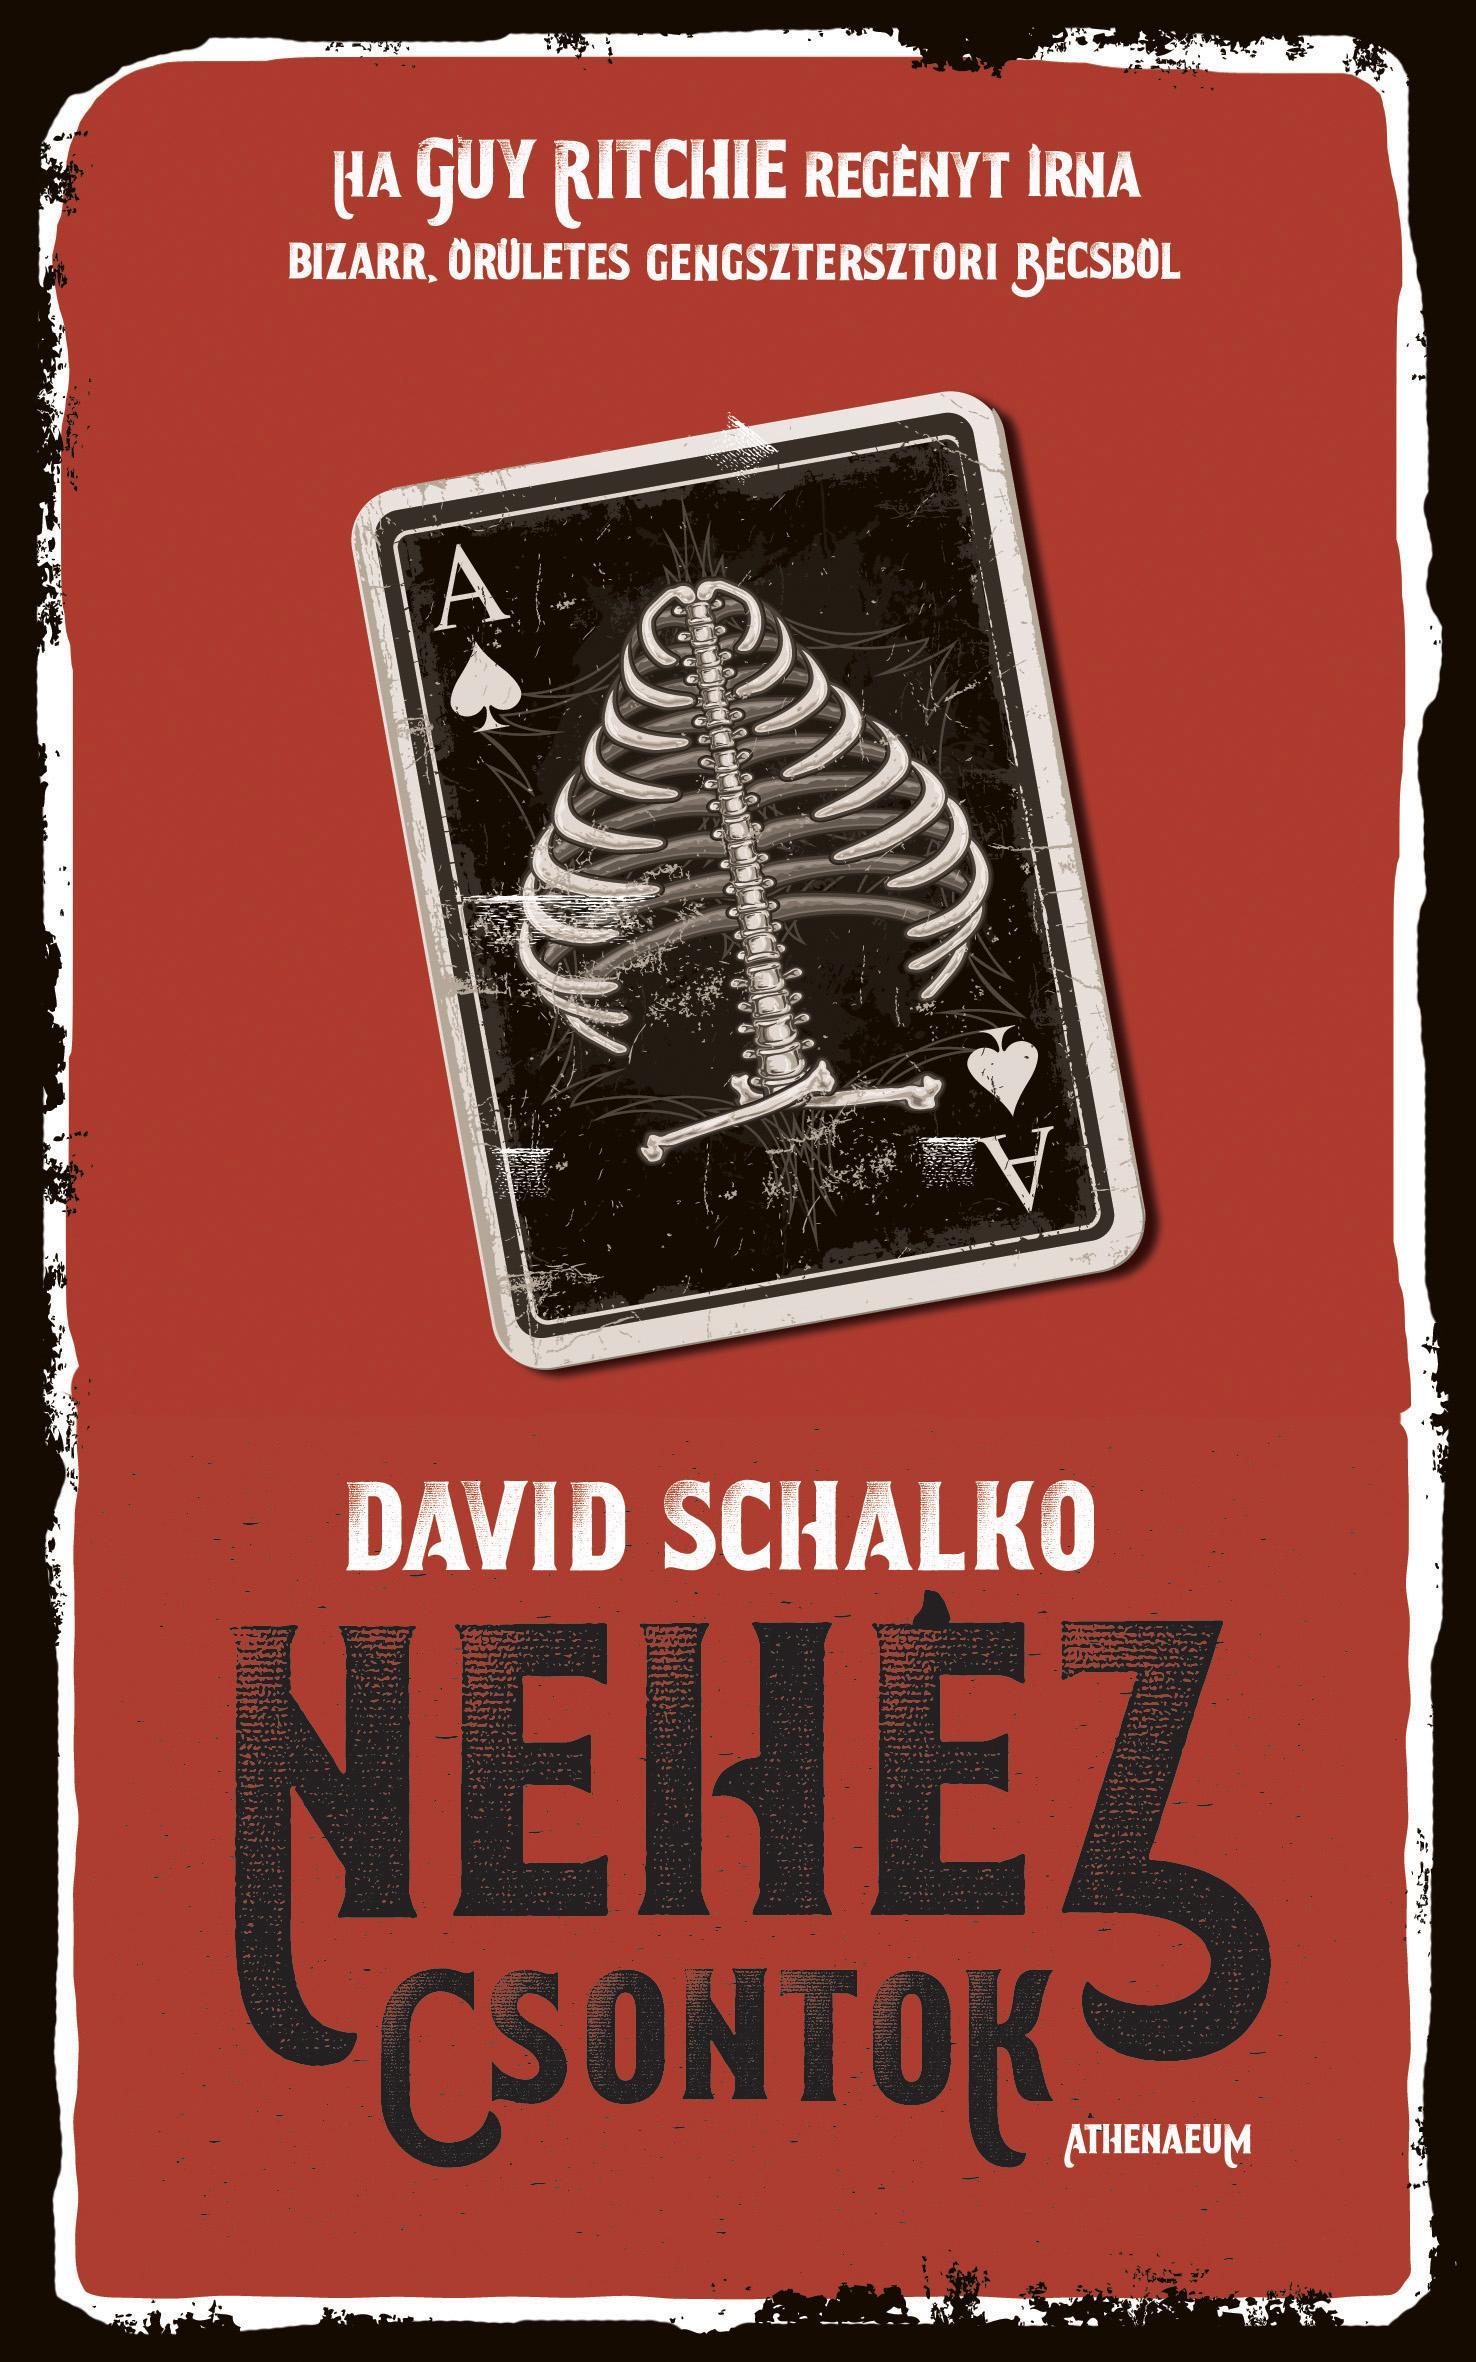 David Schalko: Nehéz csontok